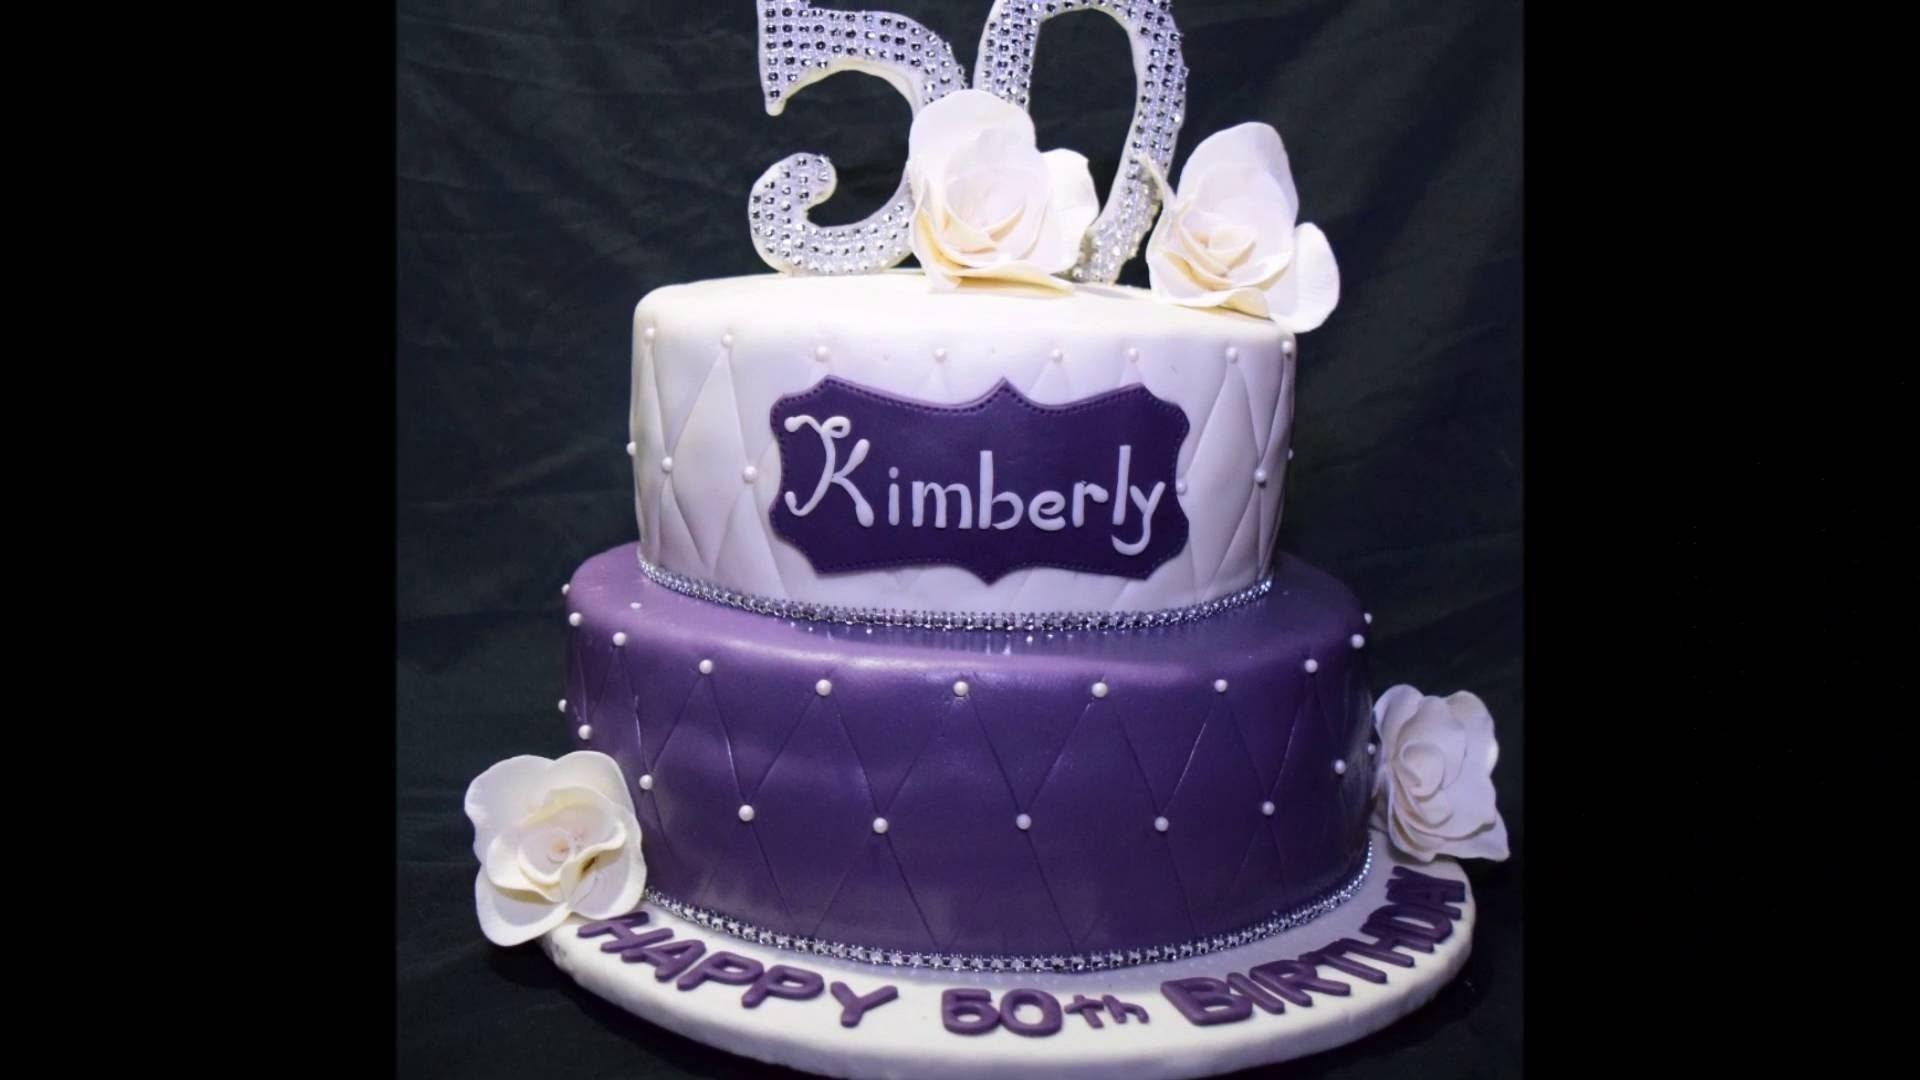 10 Wonderful Ideas For 50Th Birthday Cake 50th birthday cake youtube 1 2020